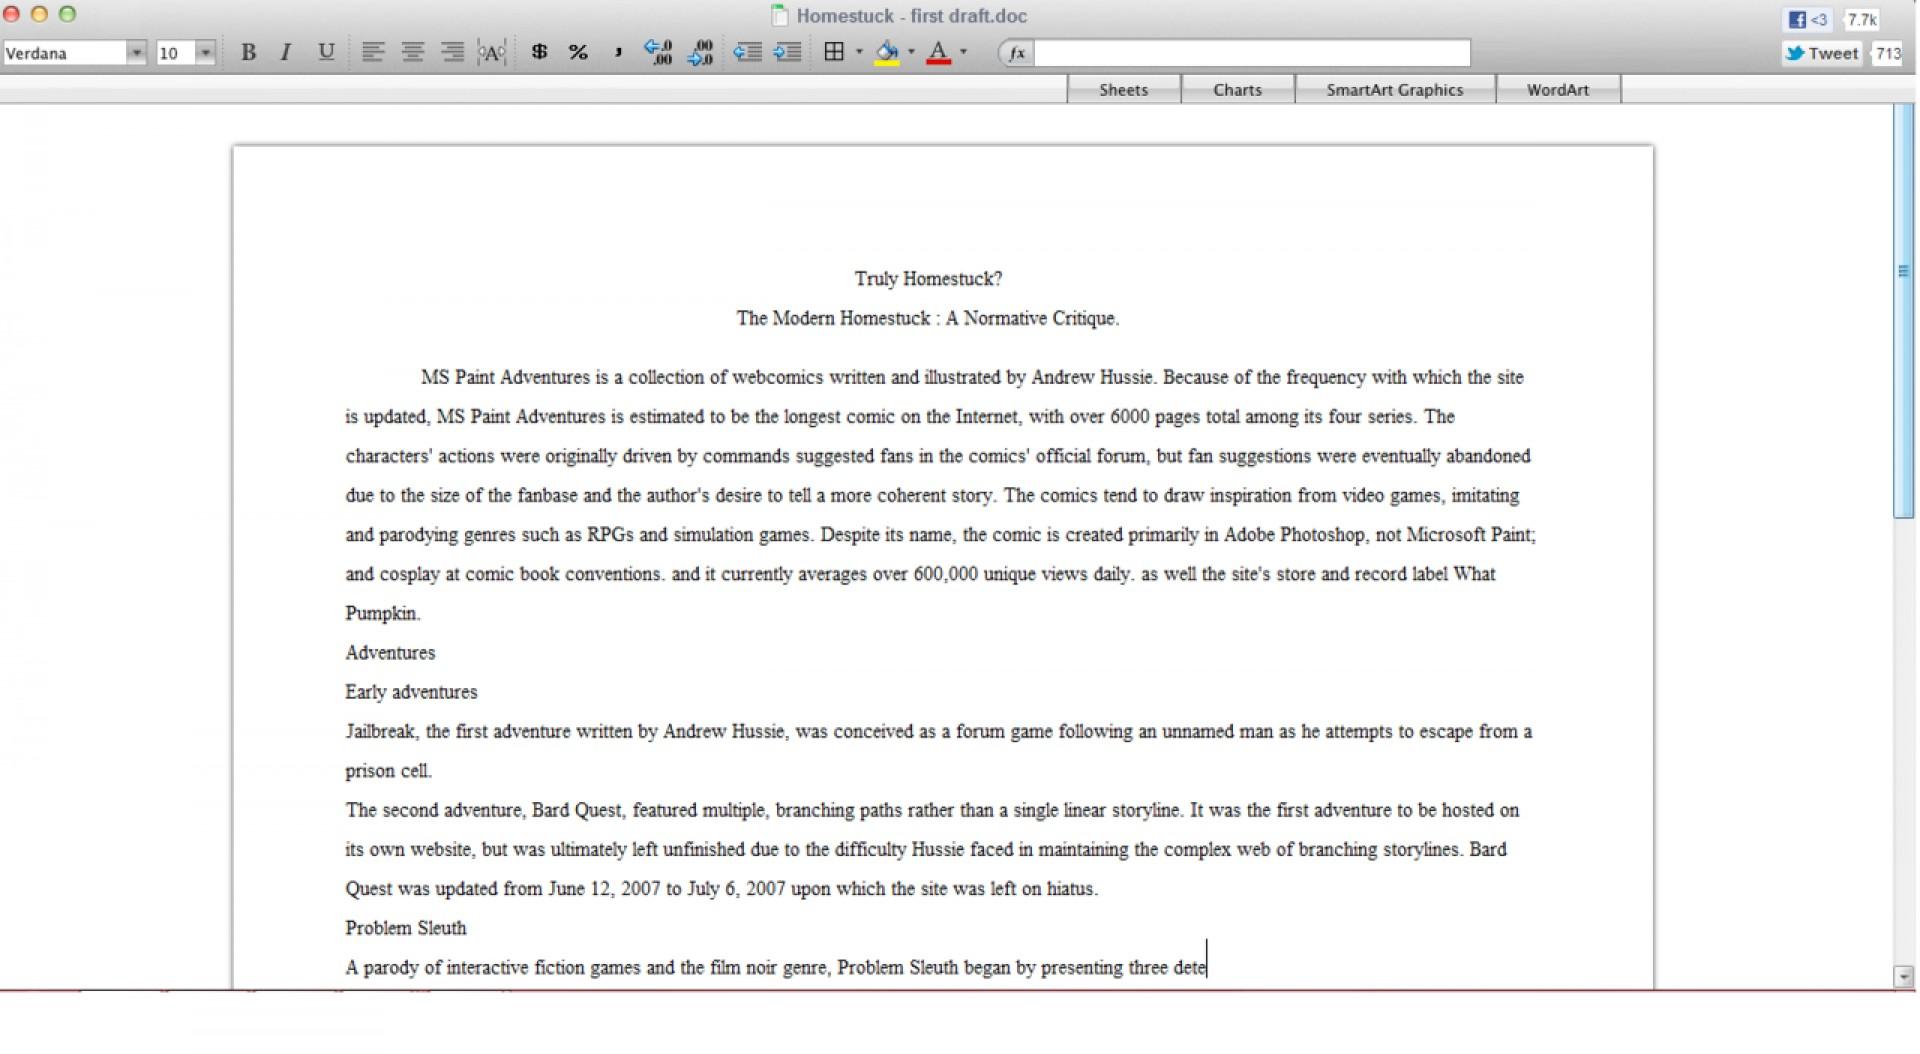 002 Mf7ae Essay Typer Com Stirring Comparative How To Use Essaytyper.com Unblocked 1920